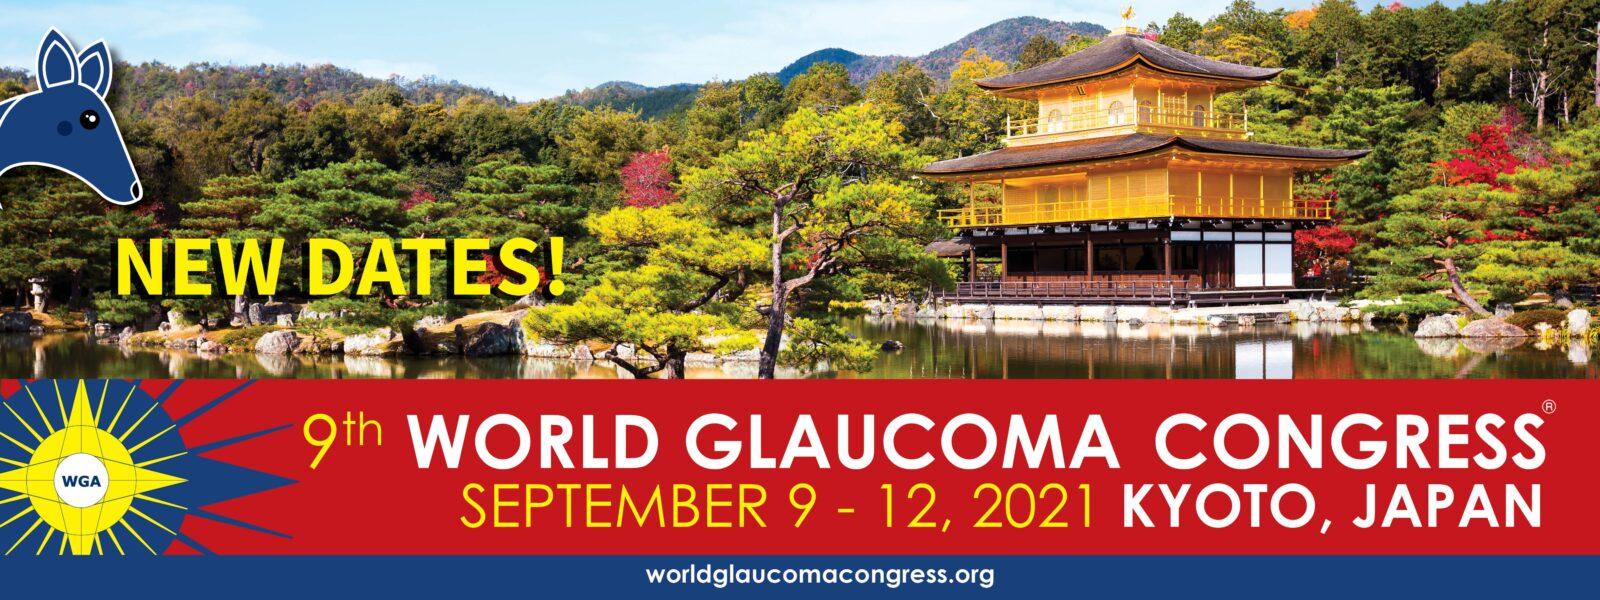 9th World Glaucoma Congress